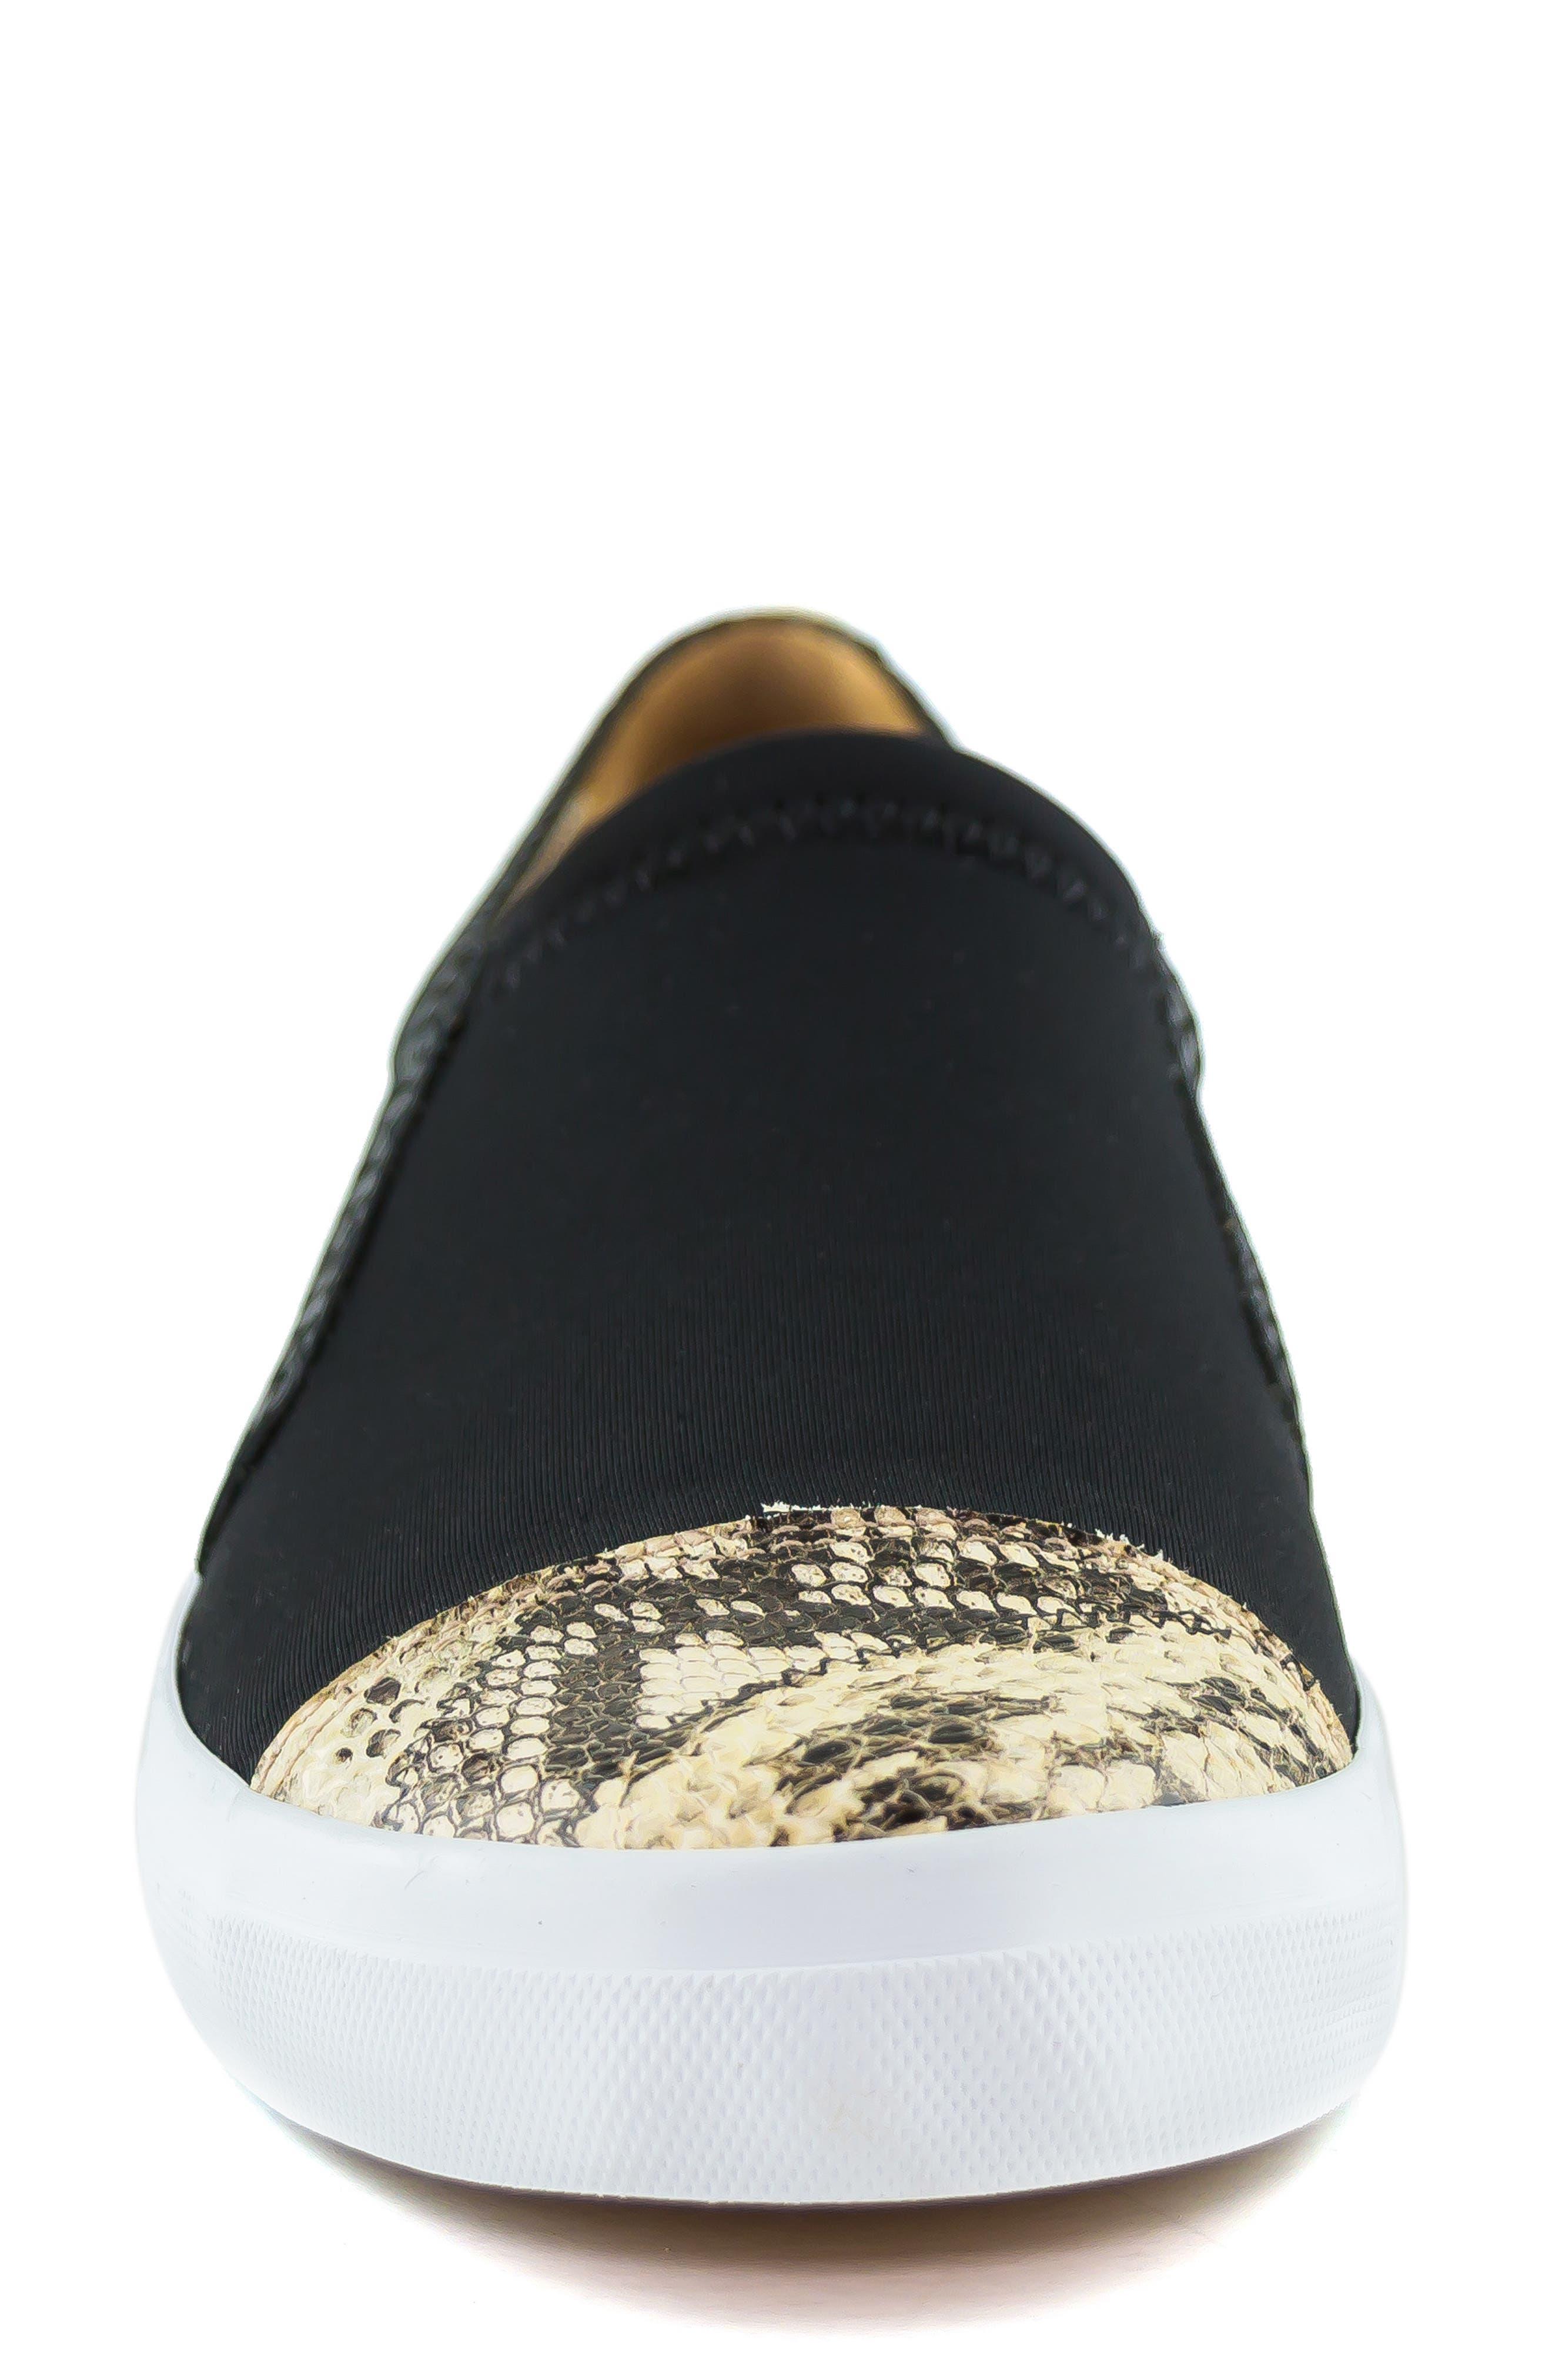 MARC JOSEPH NEW YORK, Jay Street Sneaker, Alternate thumbnail 4, color, BLACK PATCHWORK